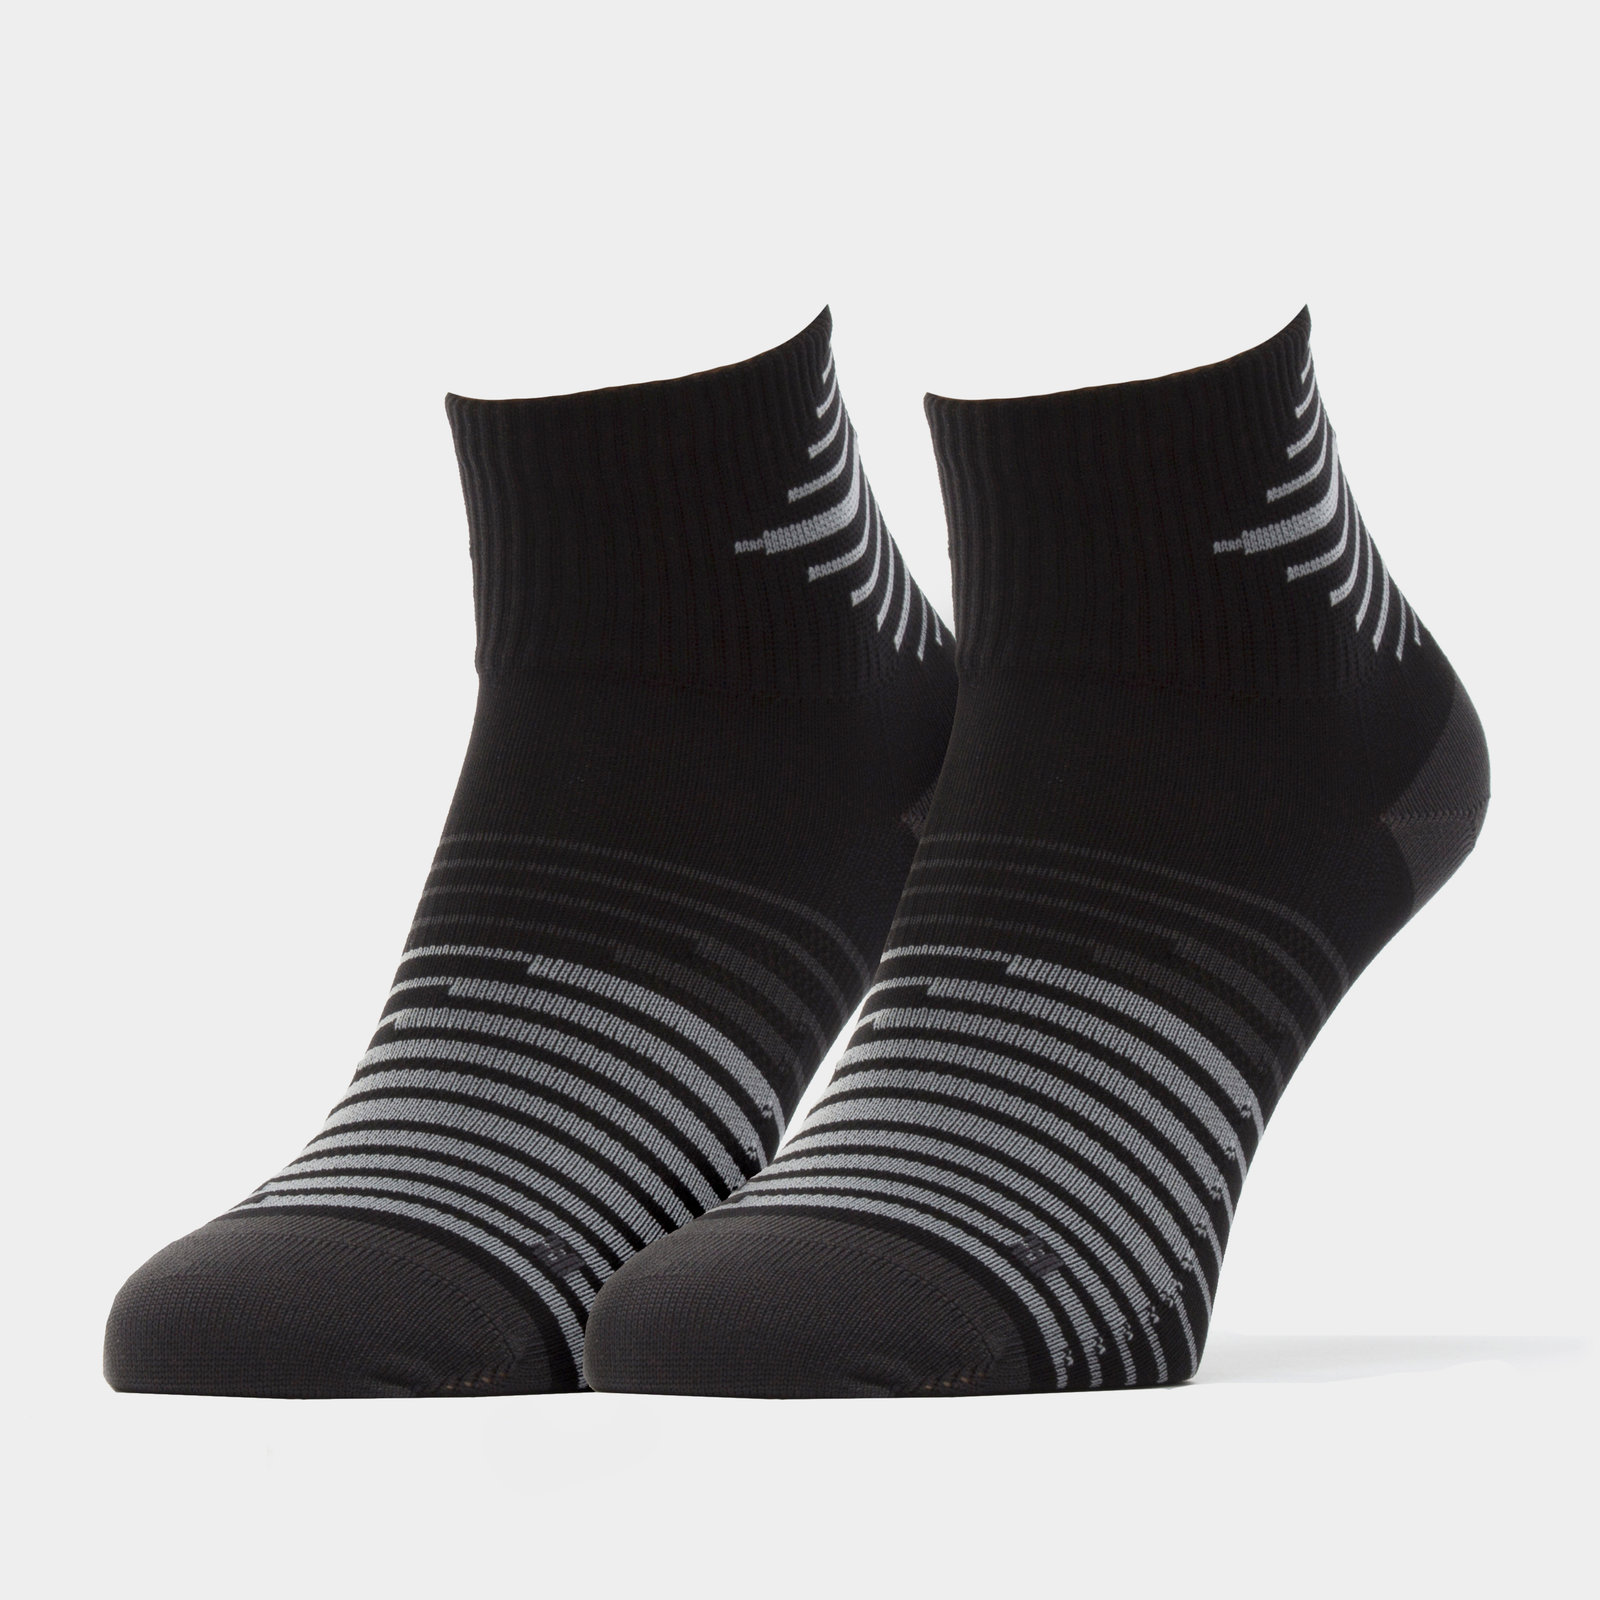 Image of 2 Pack Dri-FIT Lightweight Quarter Training Socks